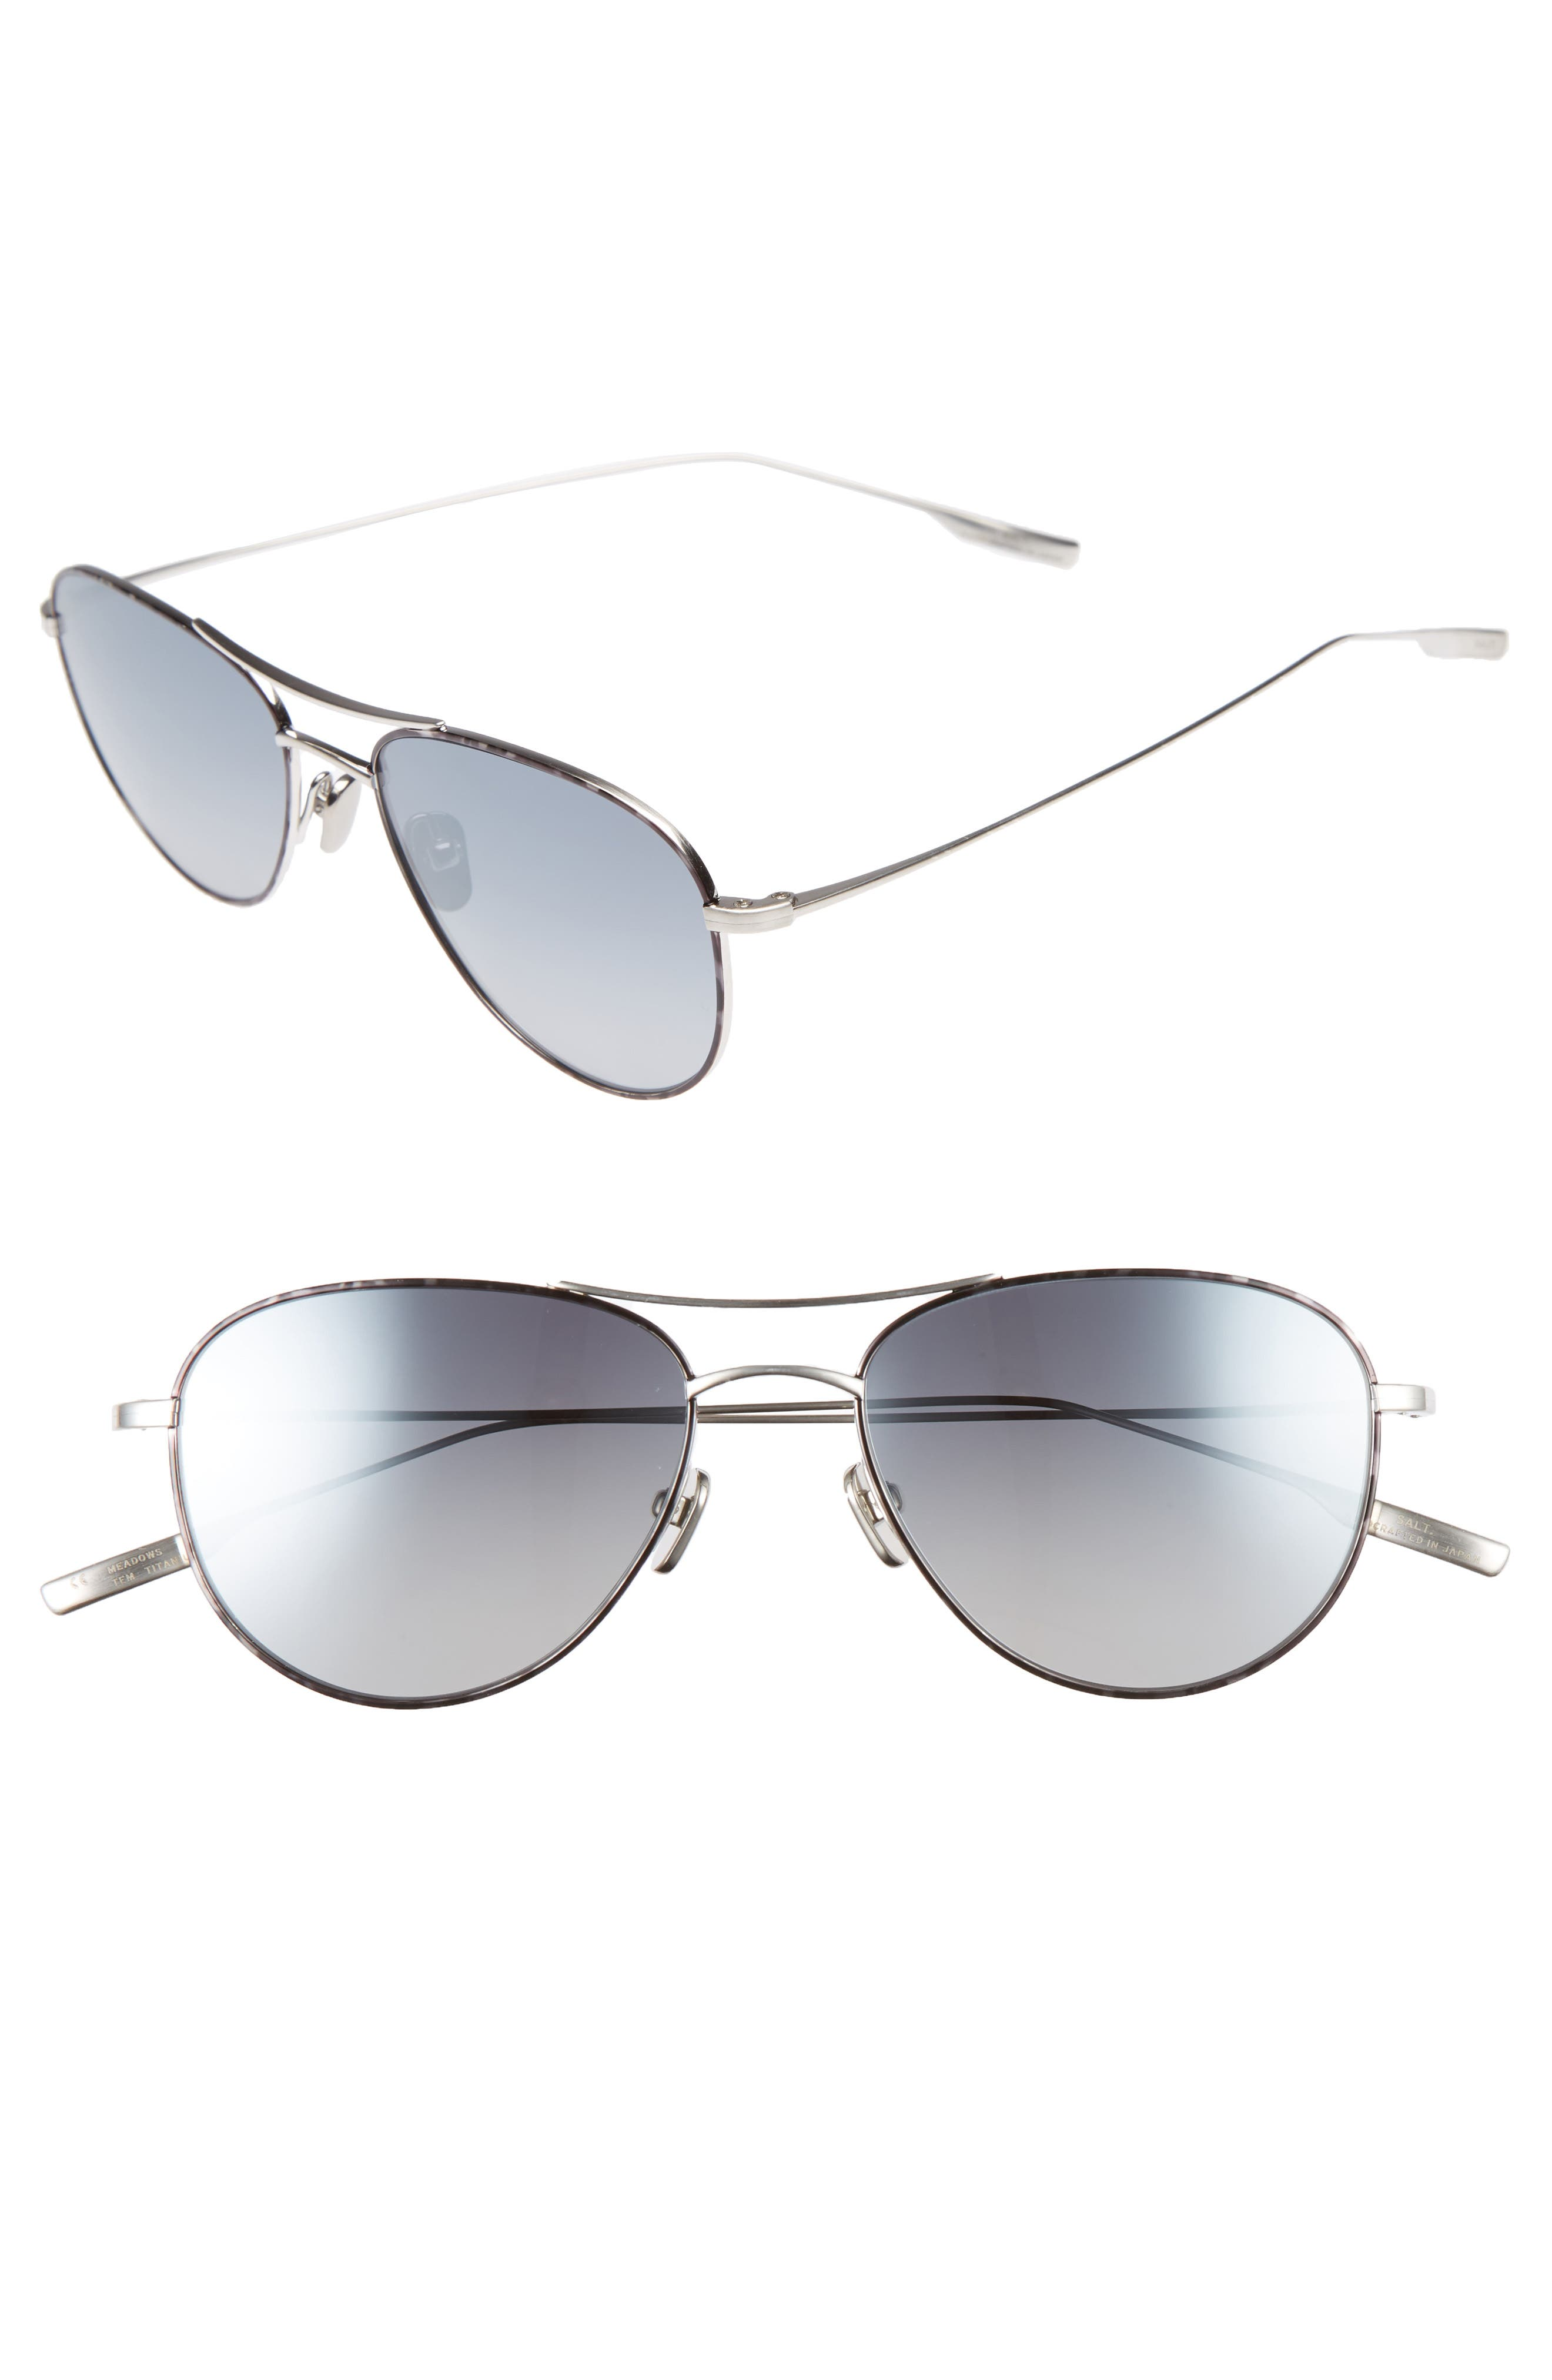 Alternate Image 1 Selected - SALT 'Meadows' 54mm Polarized Aviator Sunglasses